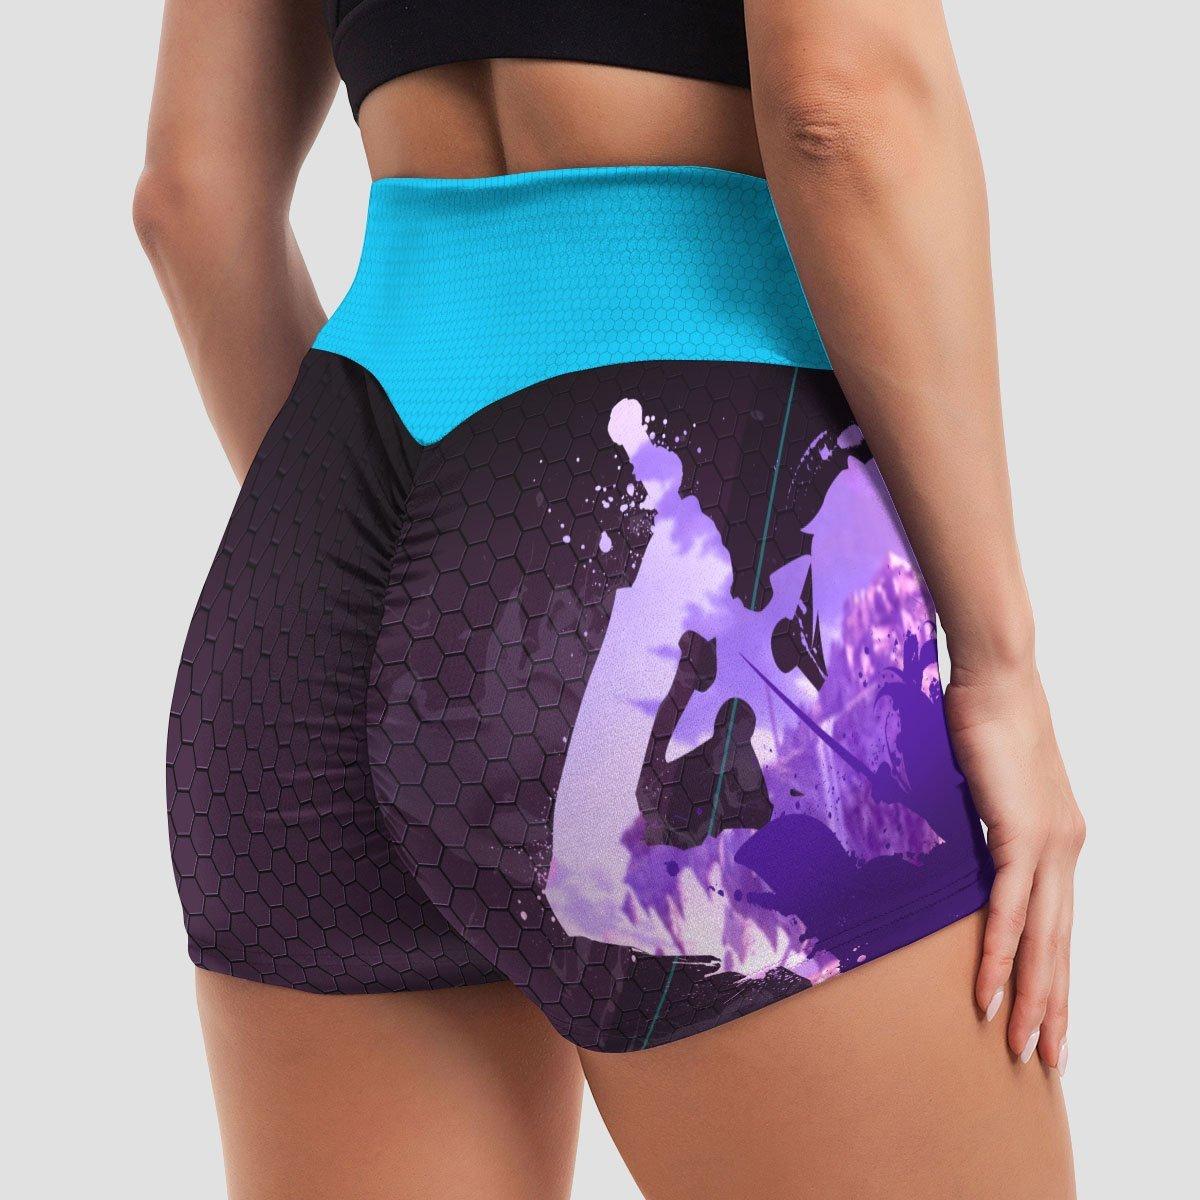 sao summer active wear set 548891 - Anime Swimsuits